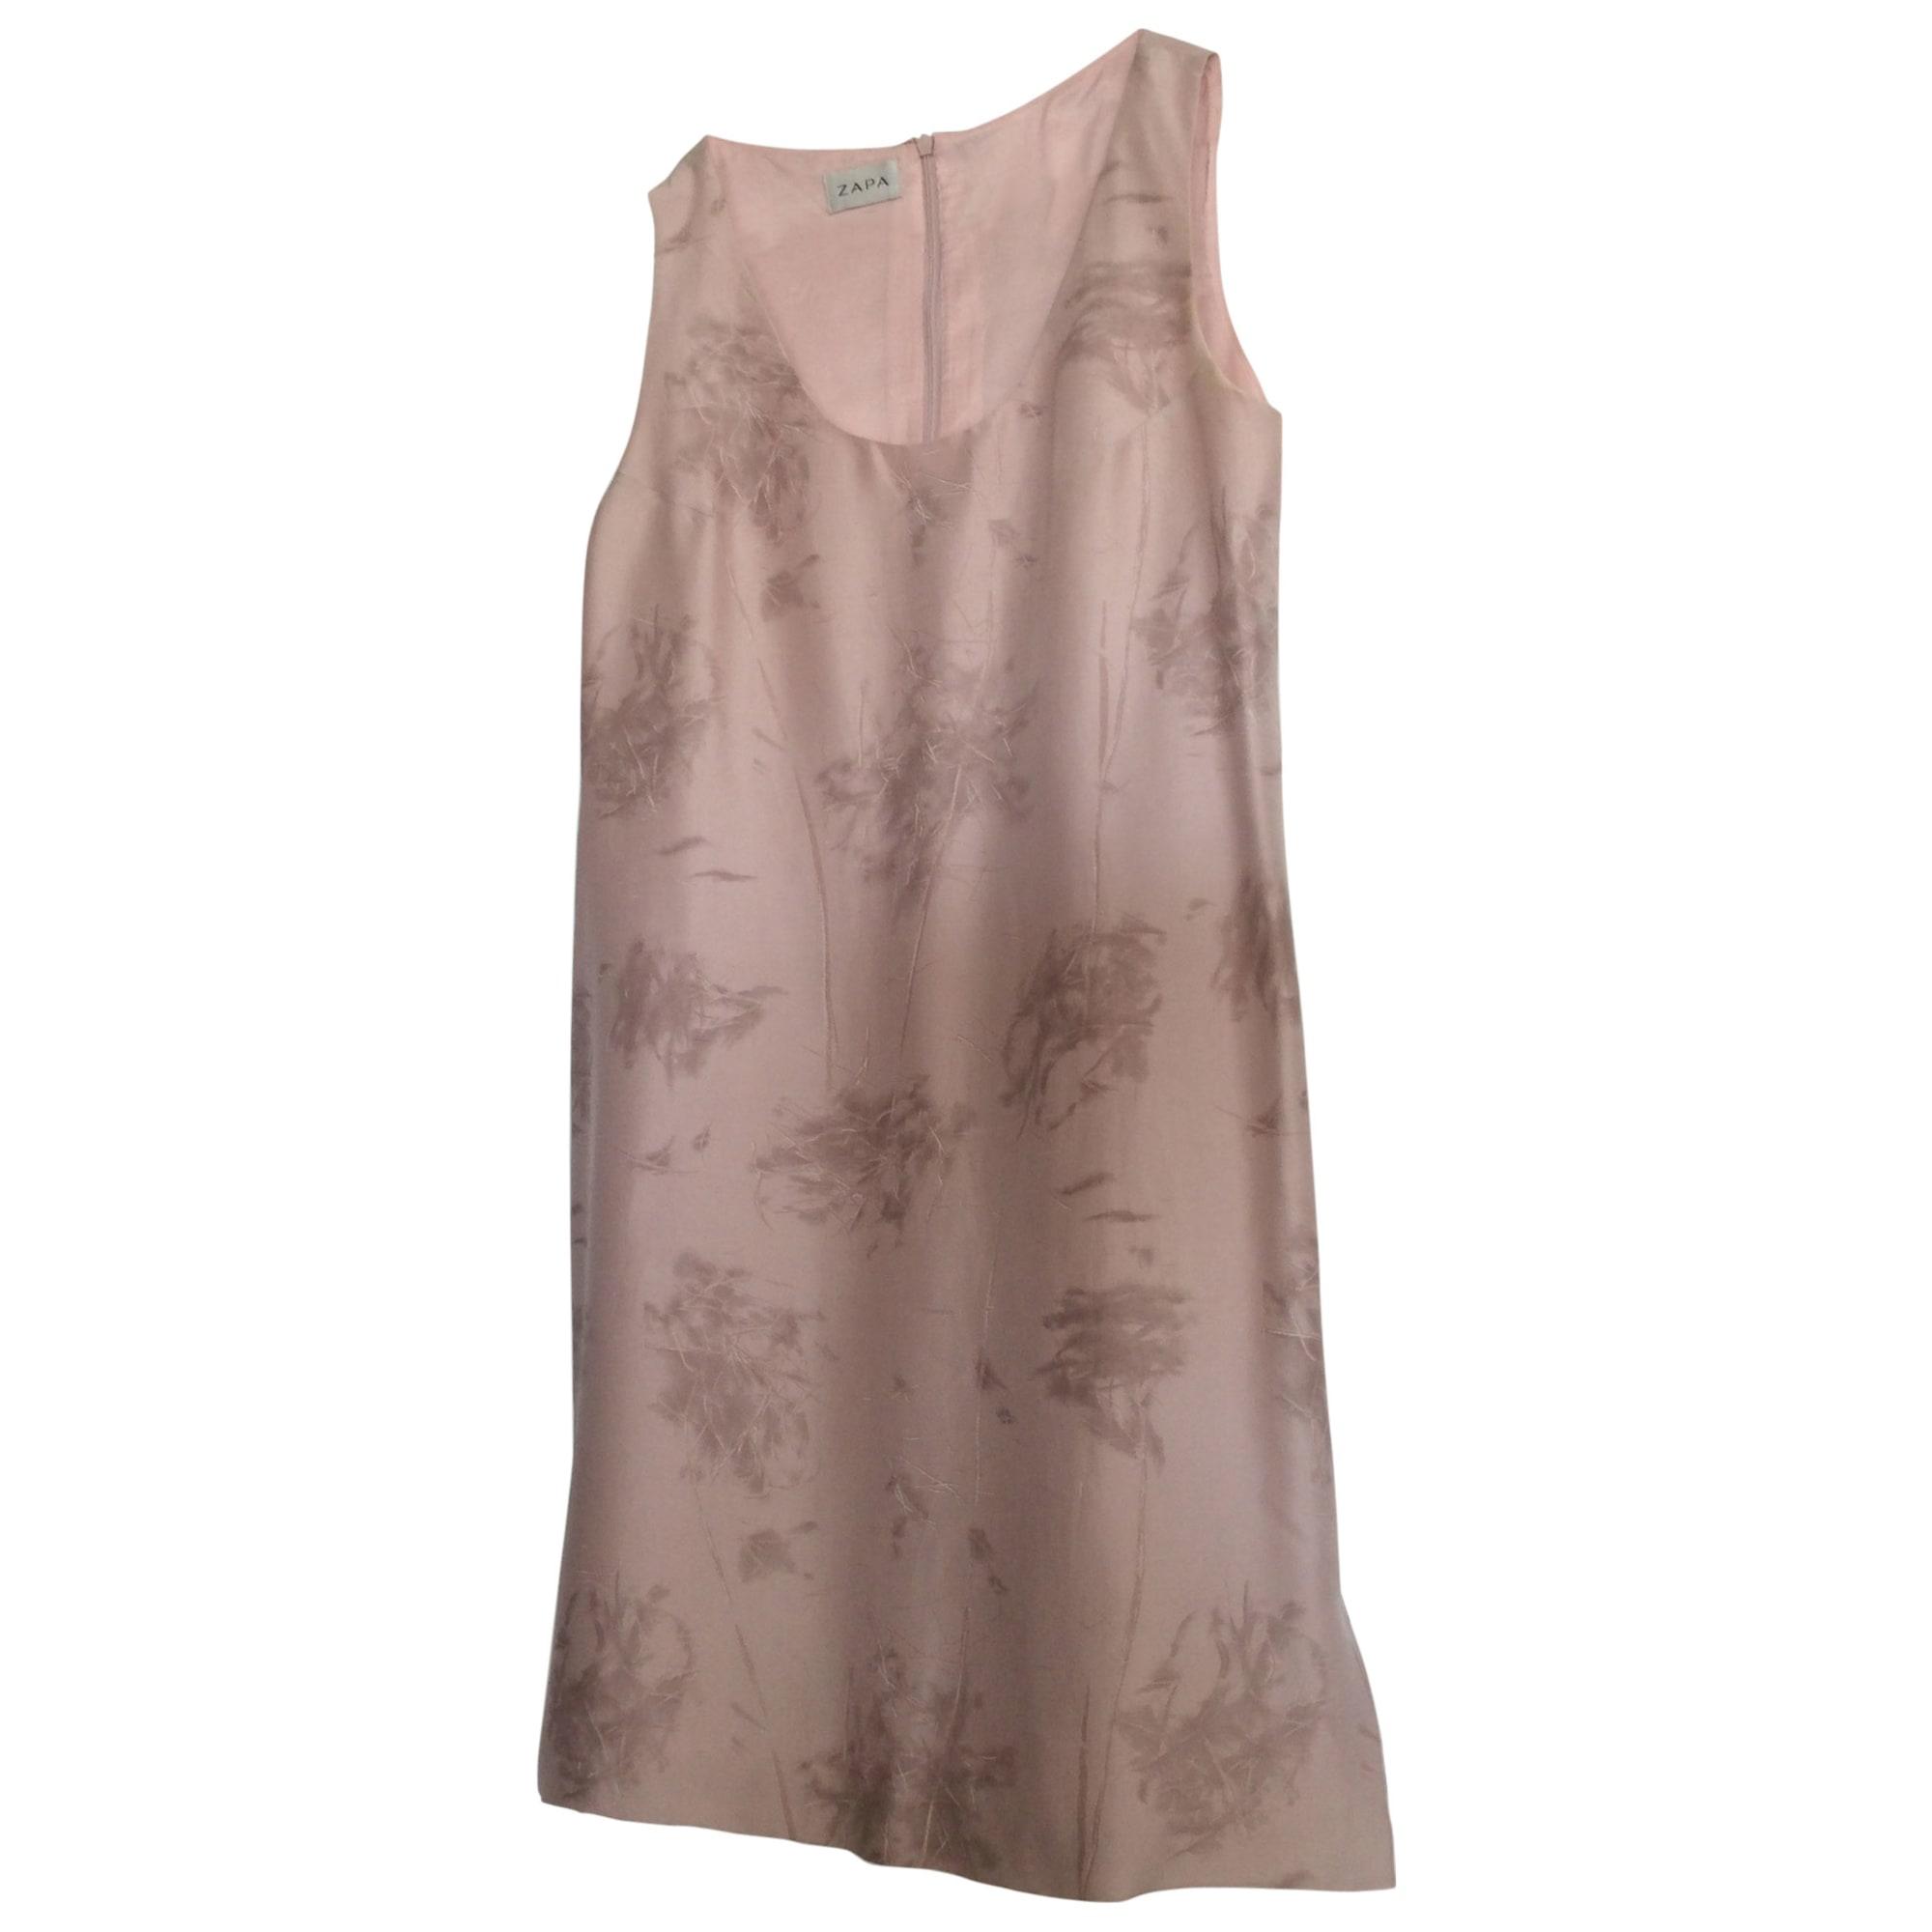 Robe courte ZAPA Rose, fuschia, vieux rose